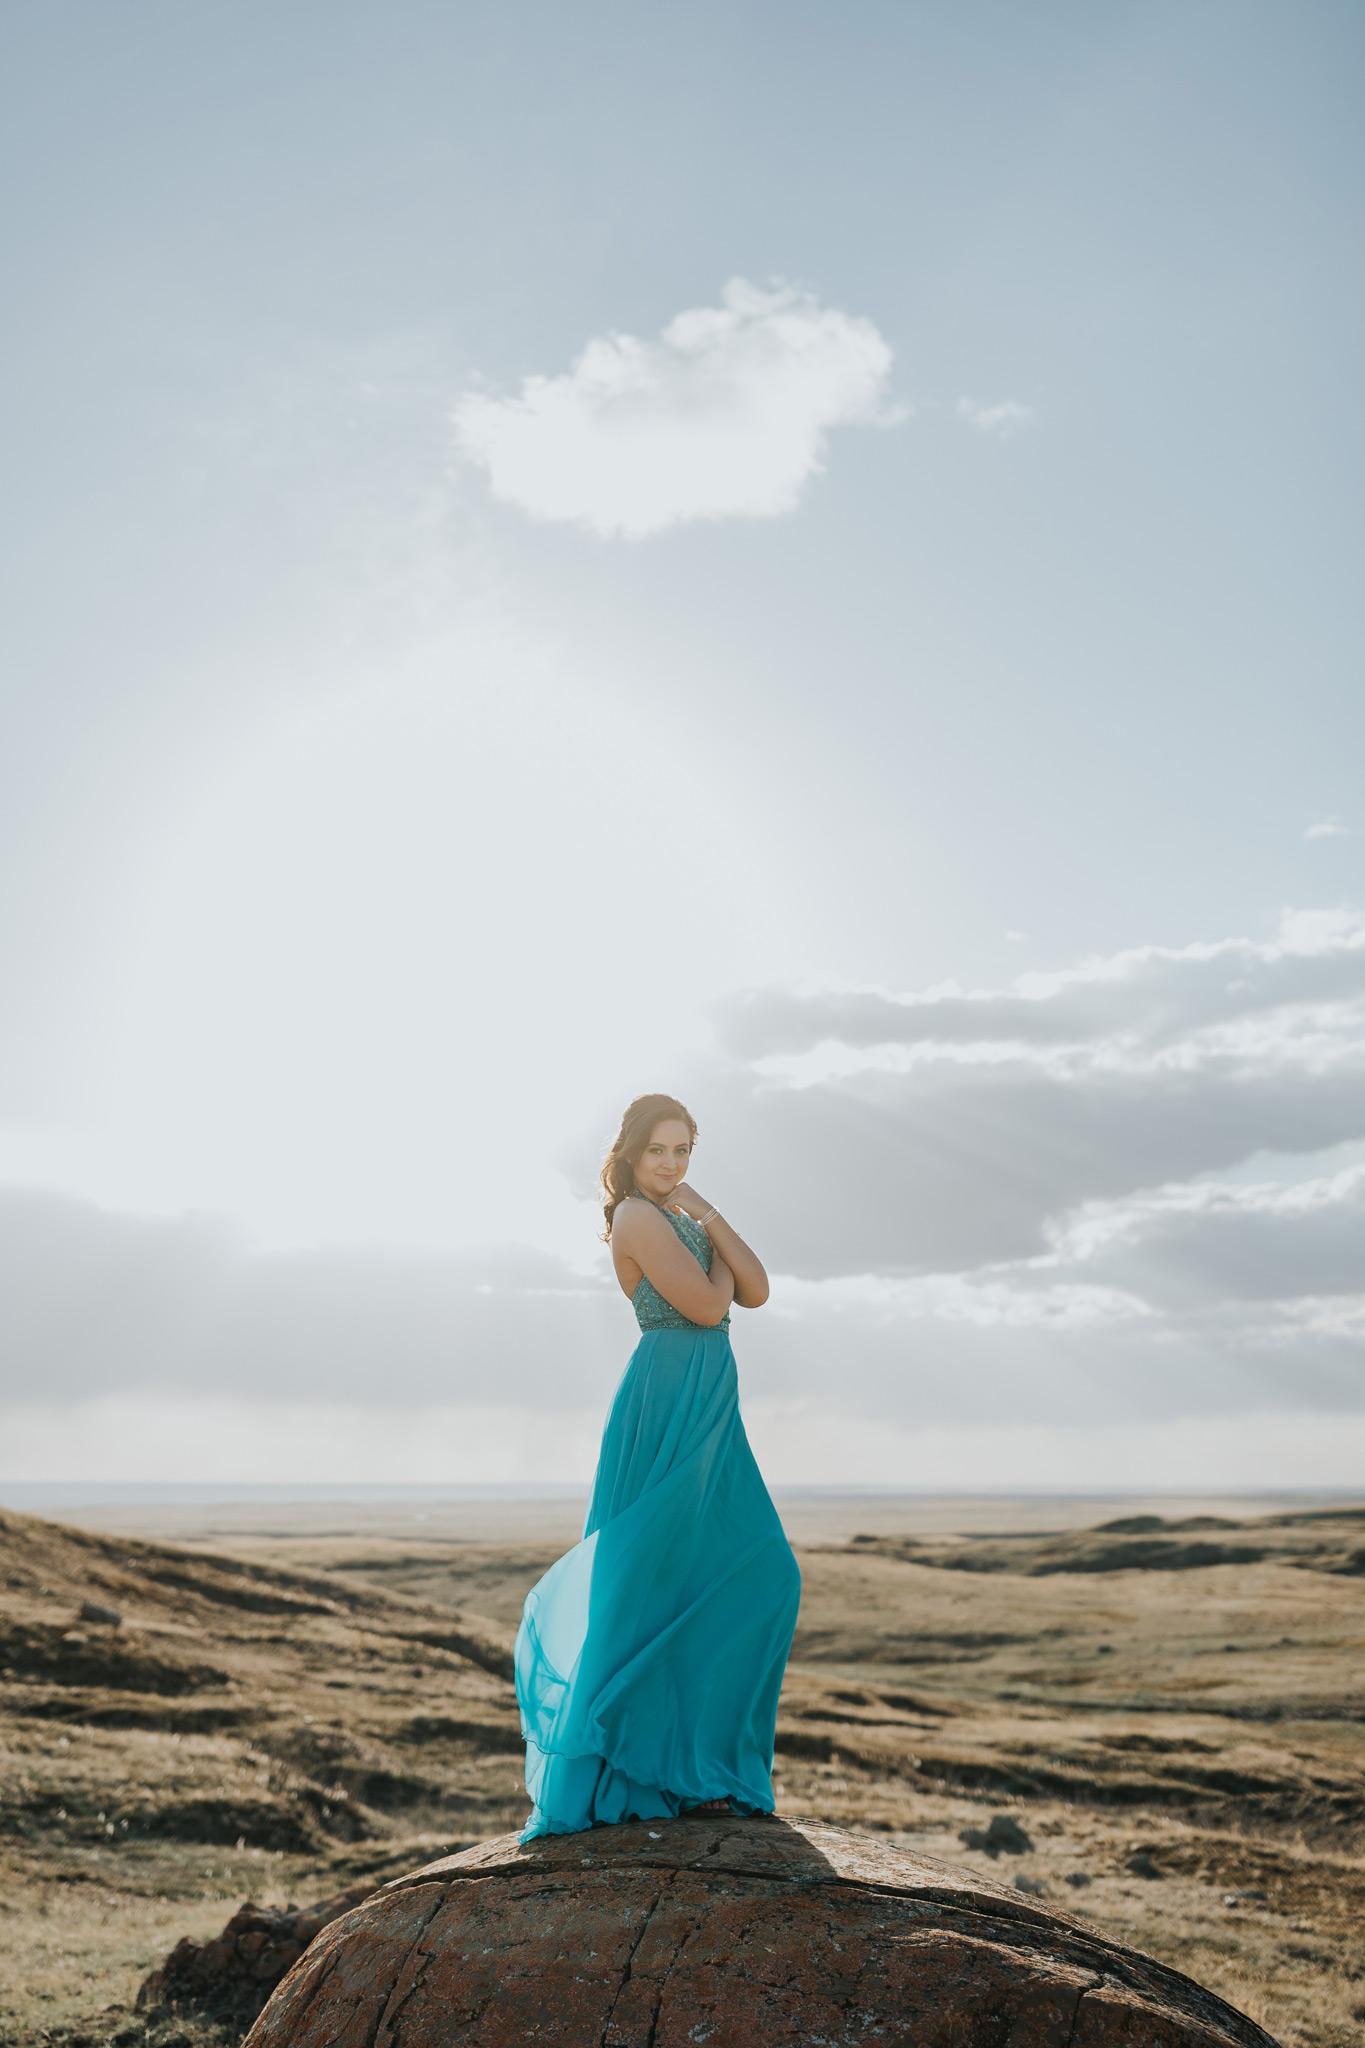 girl posing on large rock dress skirt blowing in wind